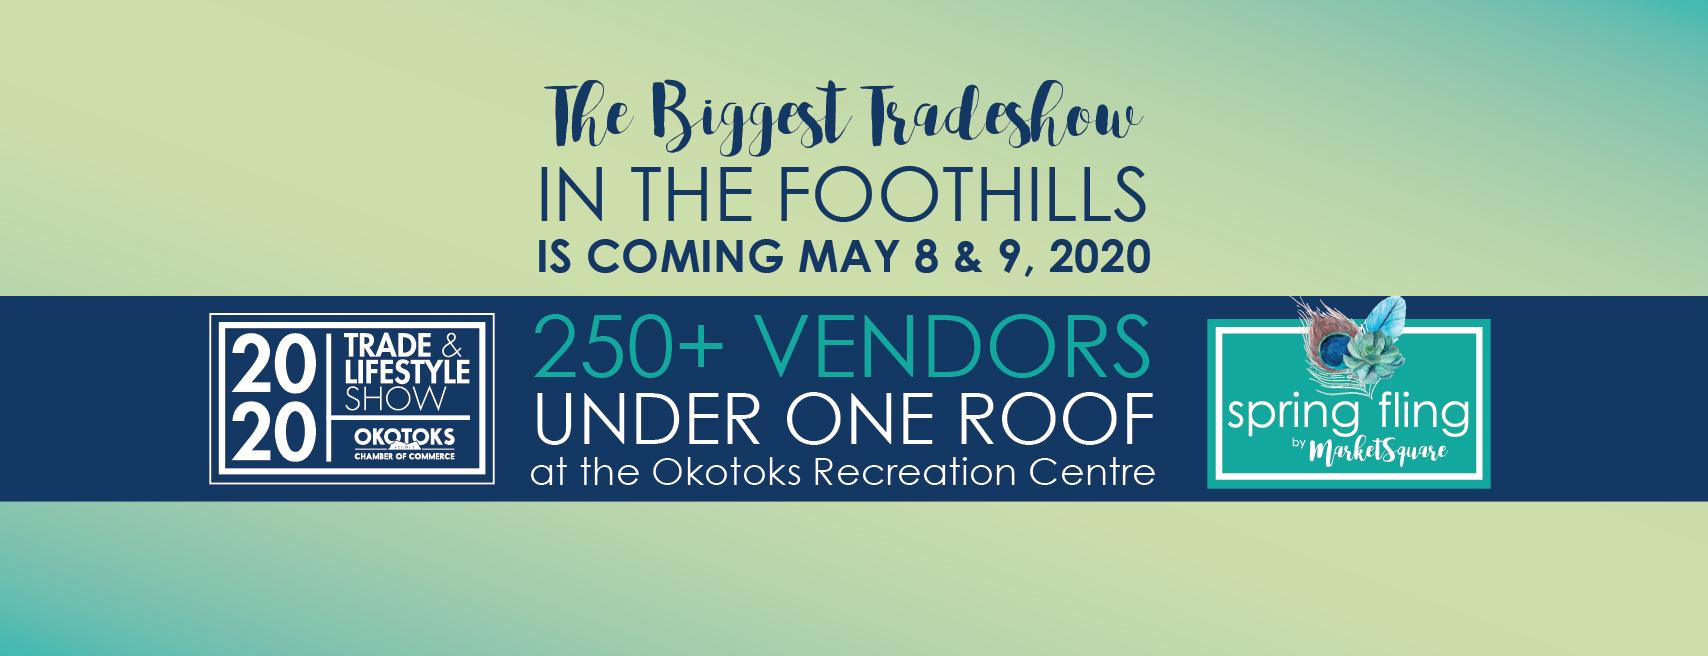 tradeshow2020-web-fb-banner.jpg